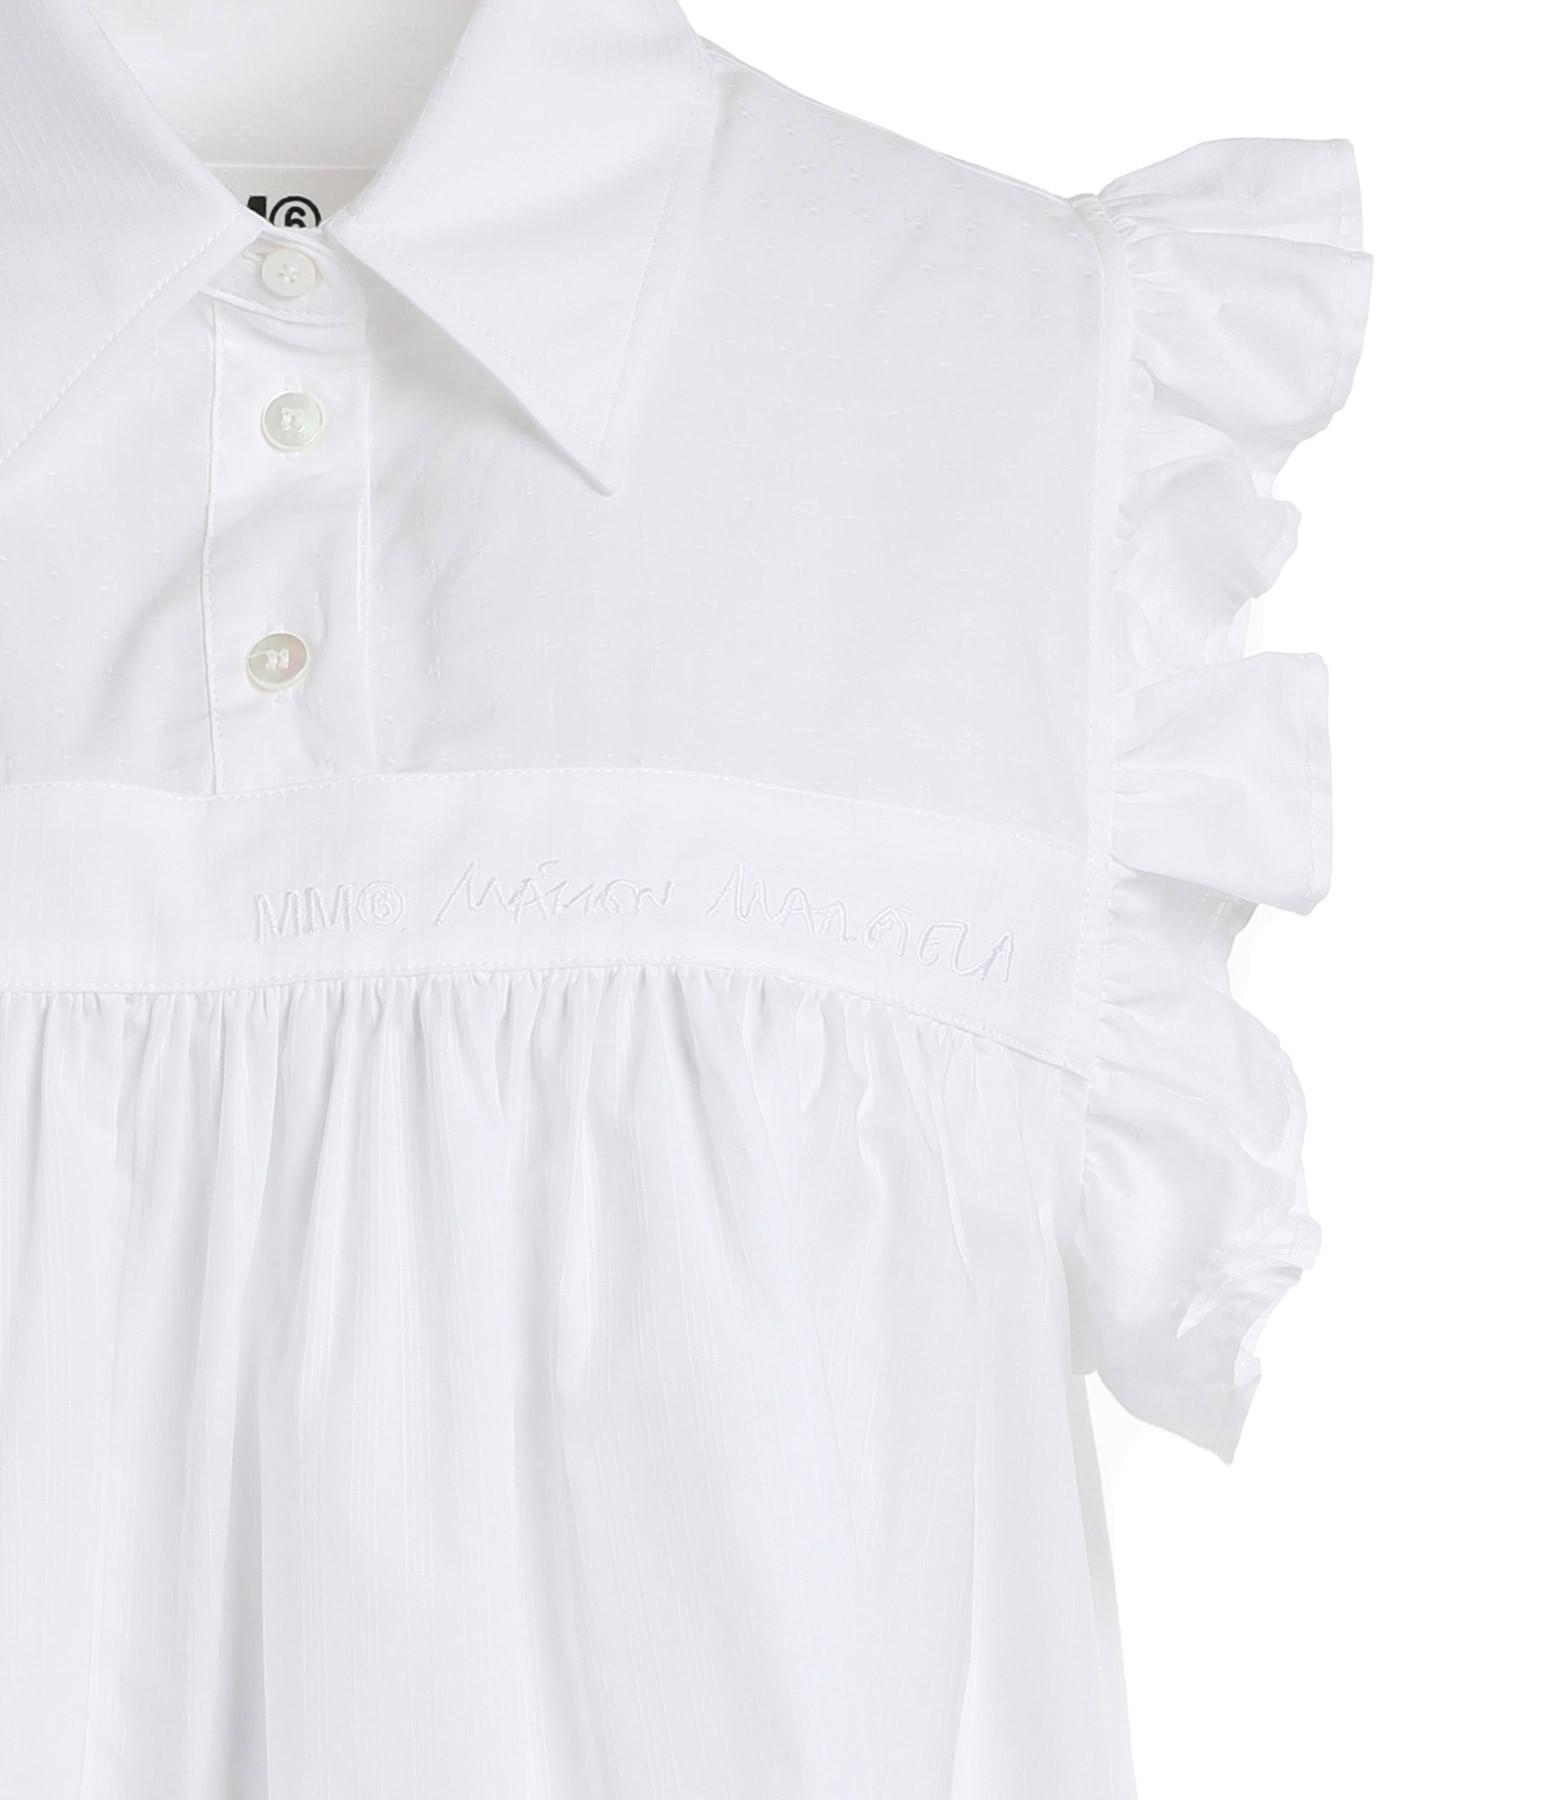 MM6 MAISON MARGIELA - Robe Volants Jacquard Blanc